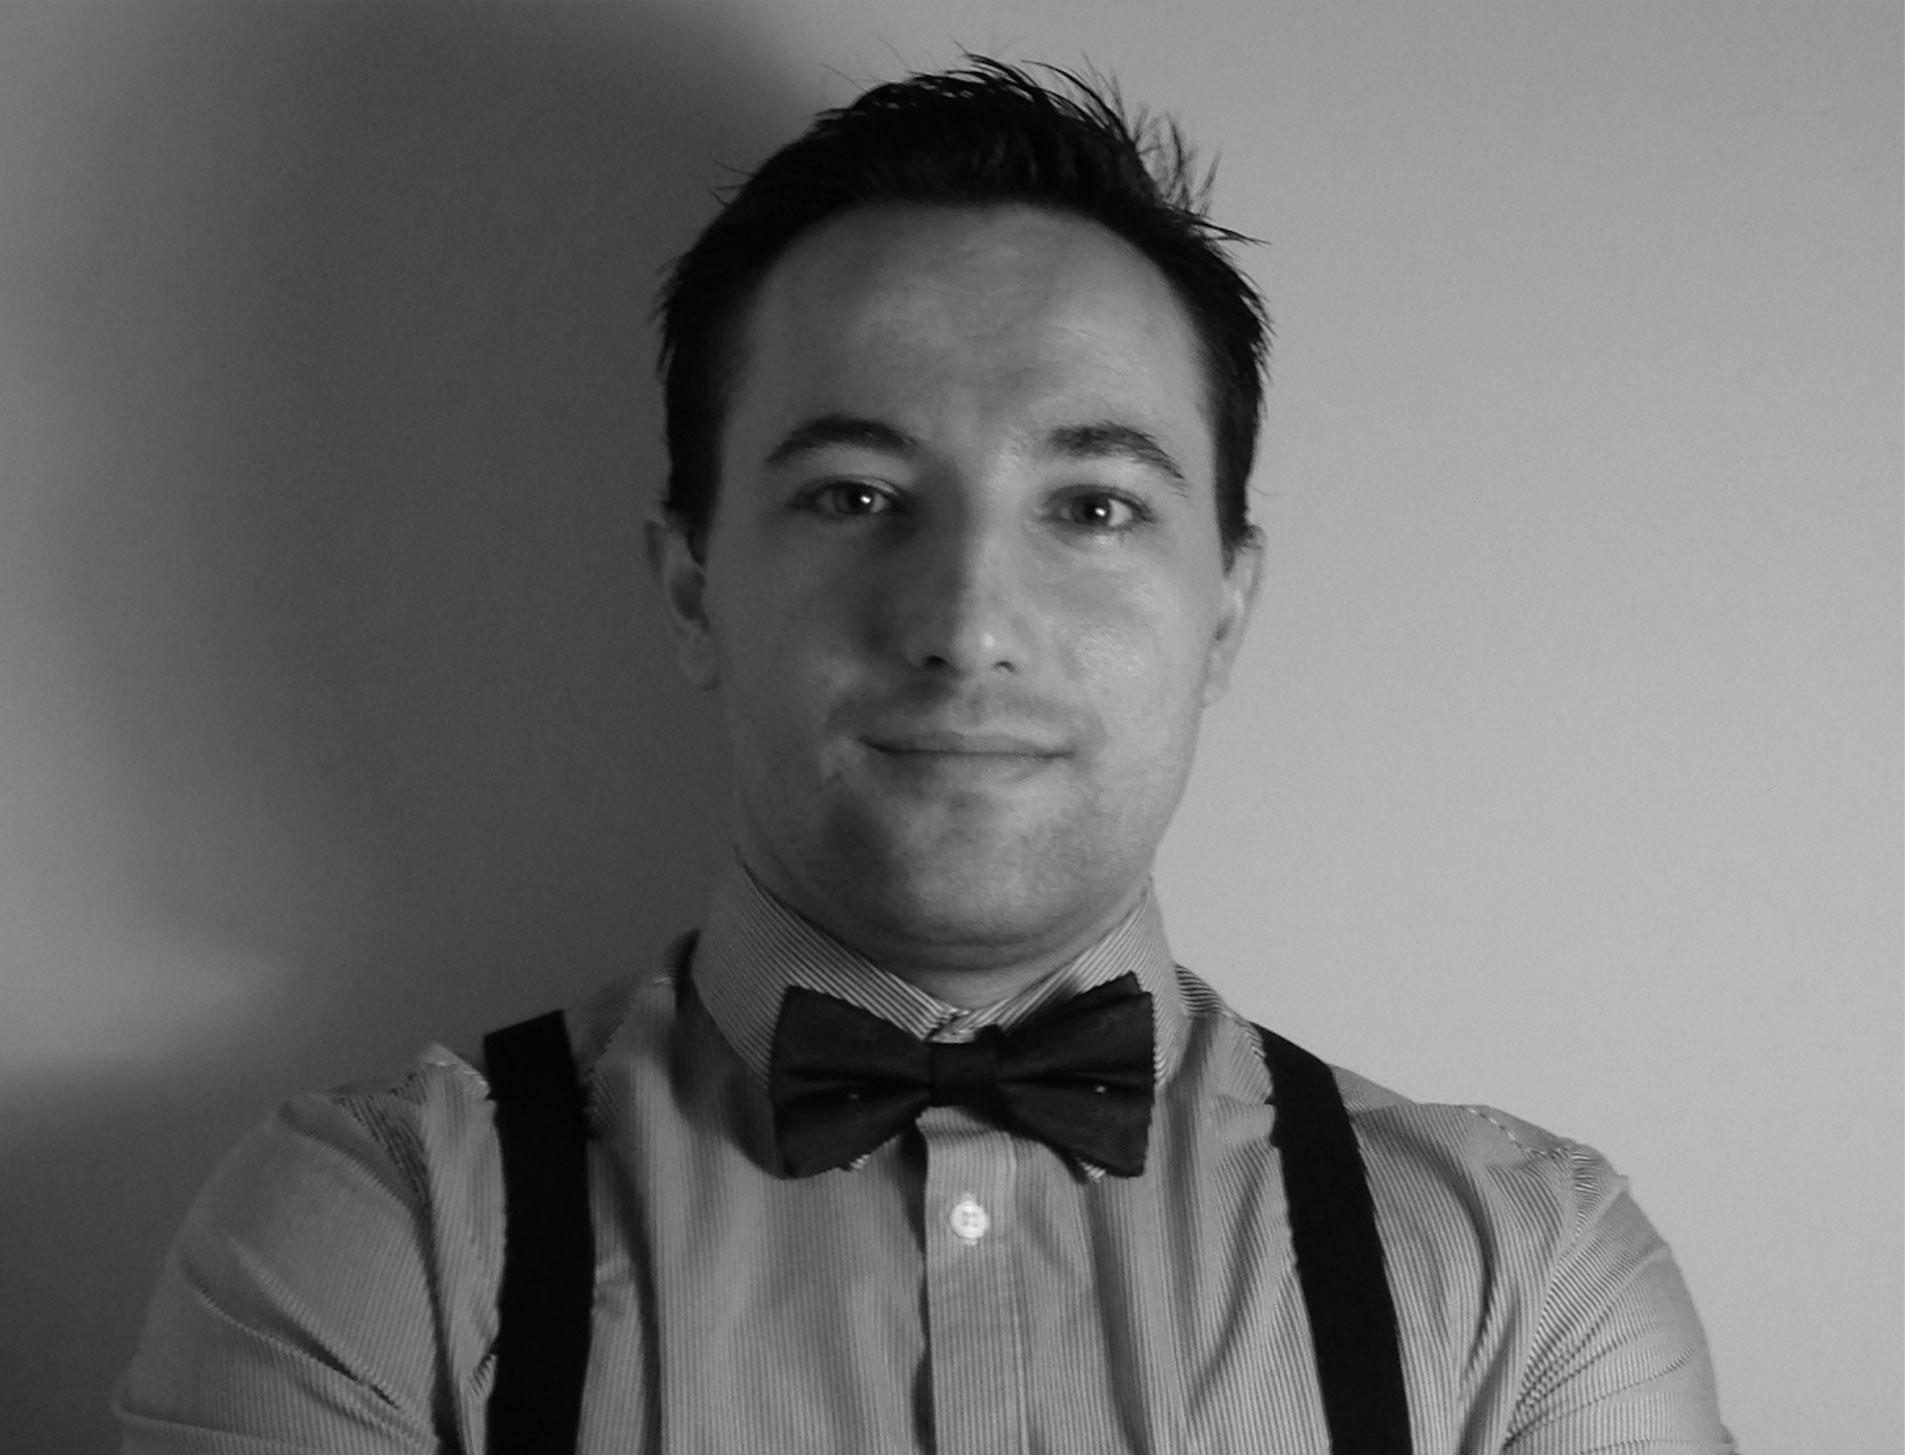 HocTok co-founder Driti